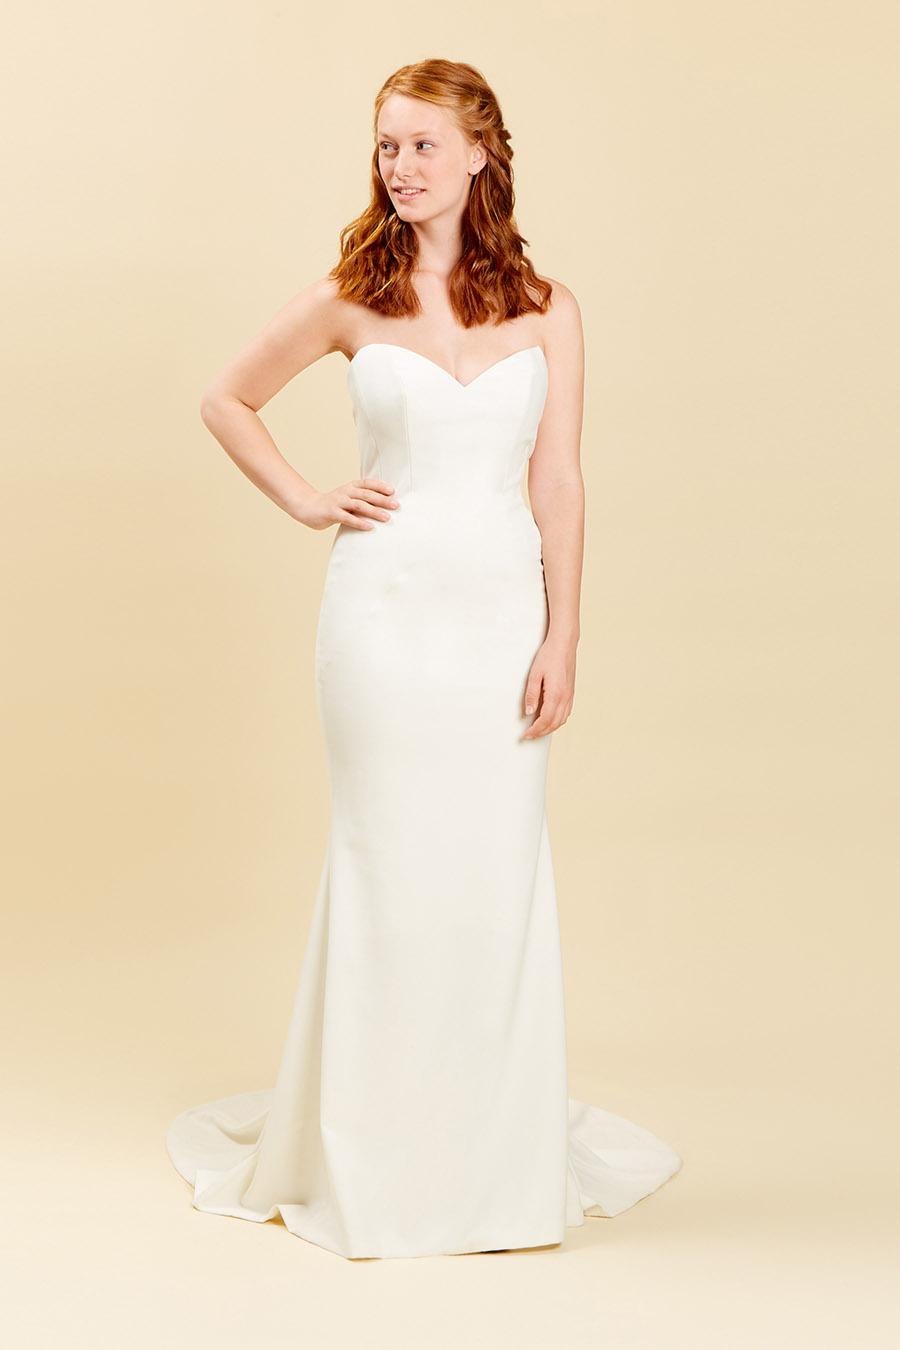 preloved wedding dresses charity wedding dress Brides Do Good UK (13)